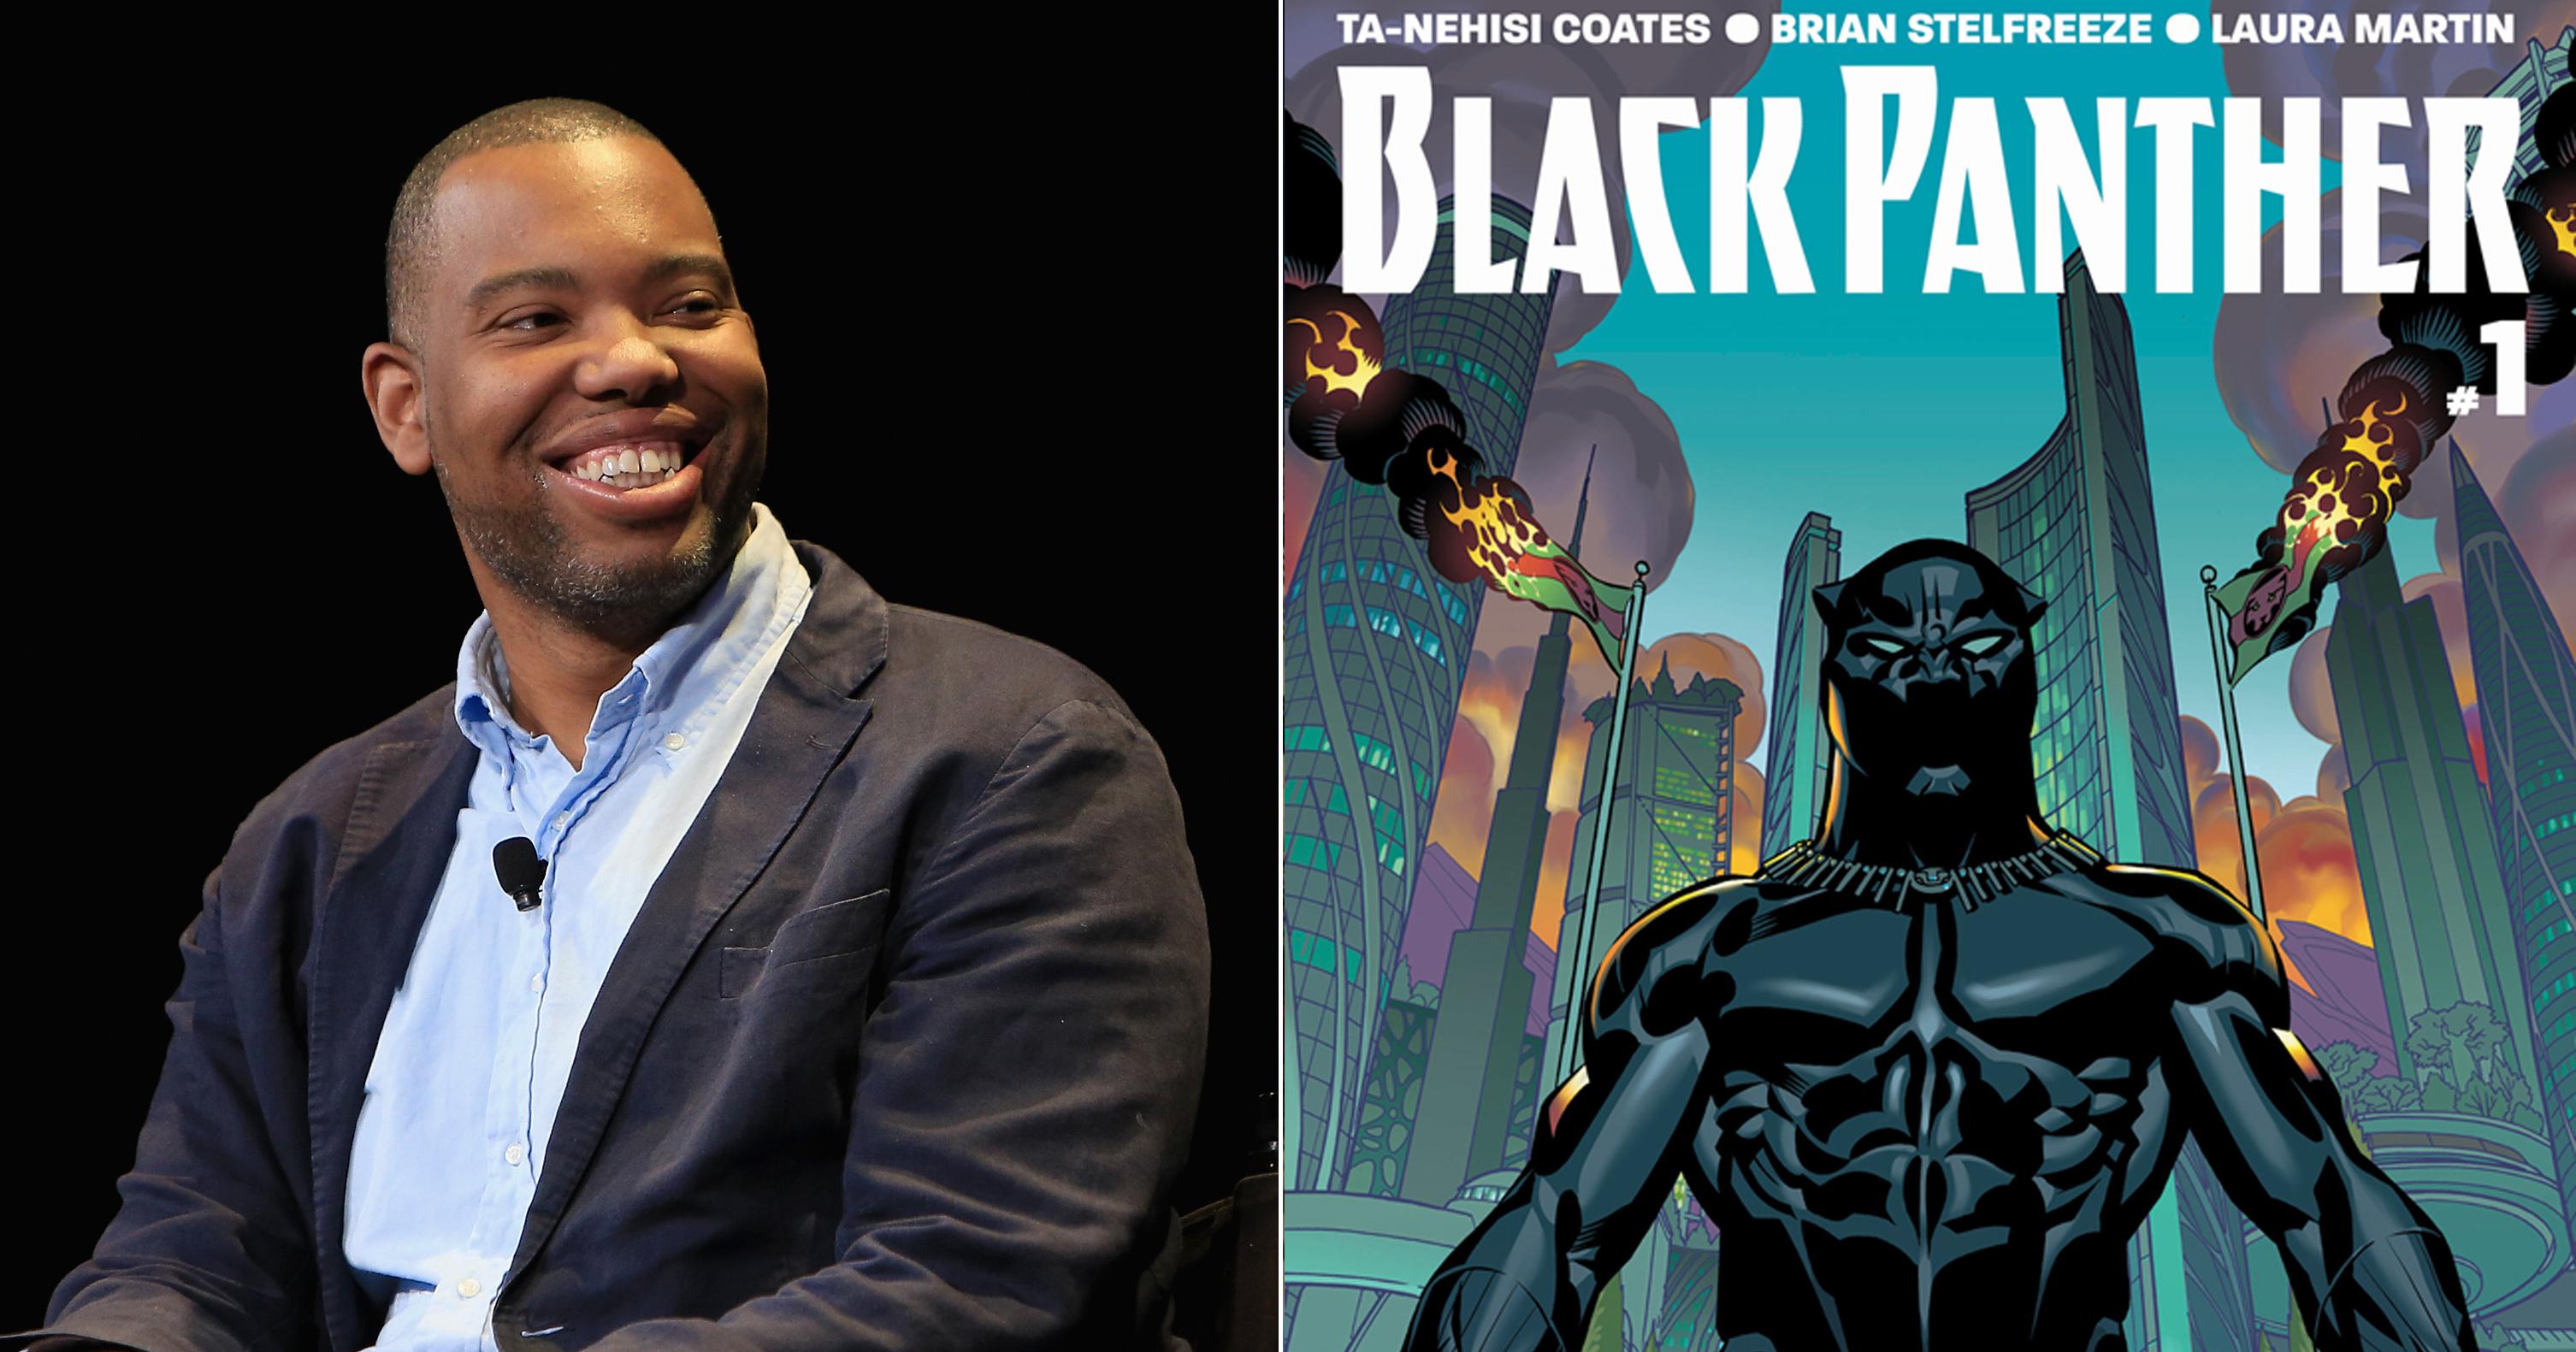 Ta-Nehisi Coates, author of the new Black Panter Marvel comics